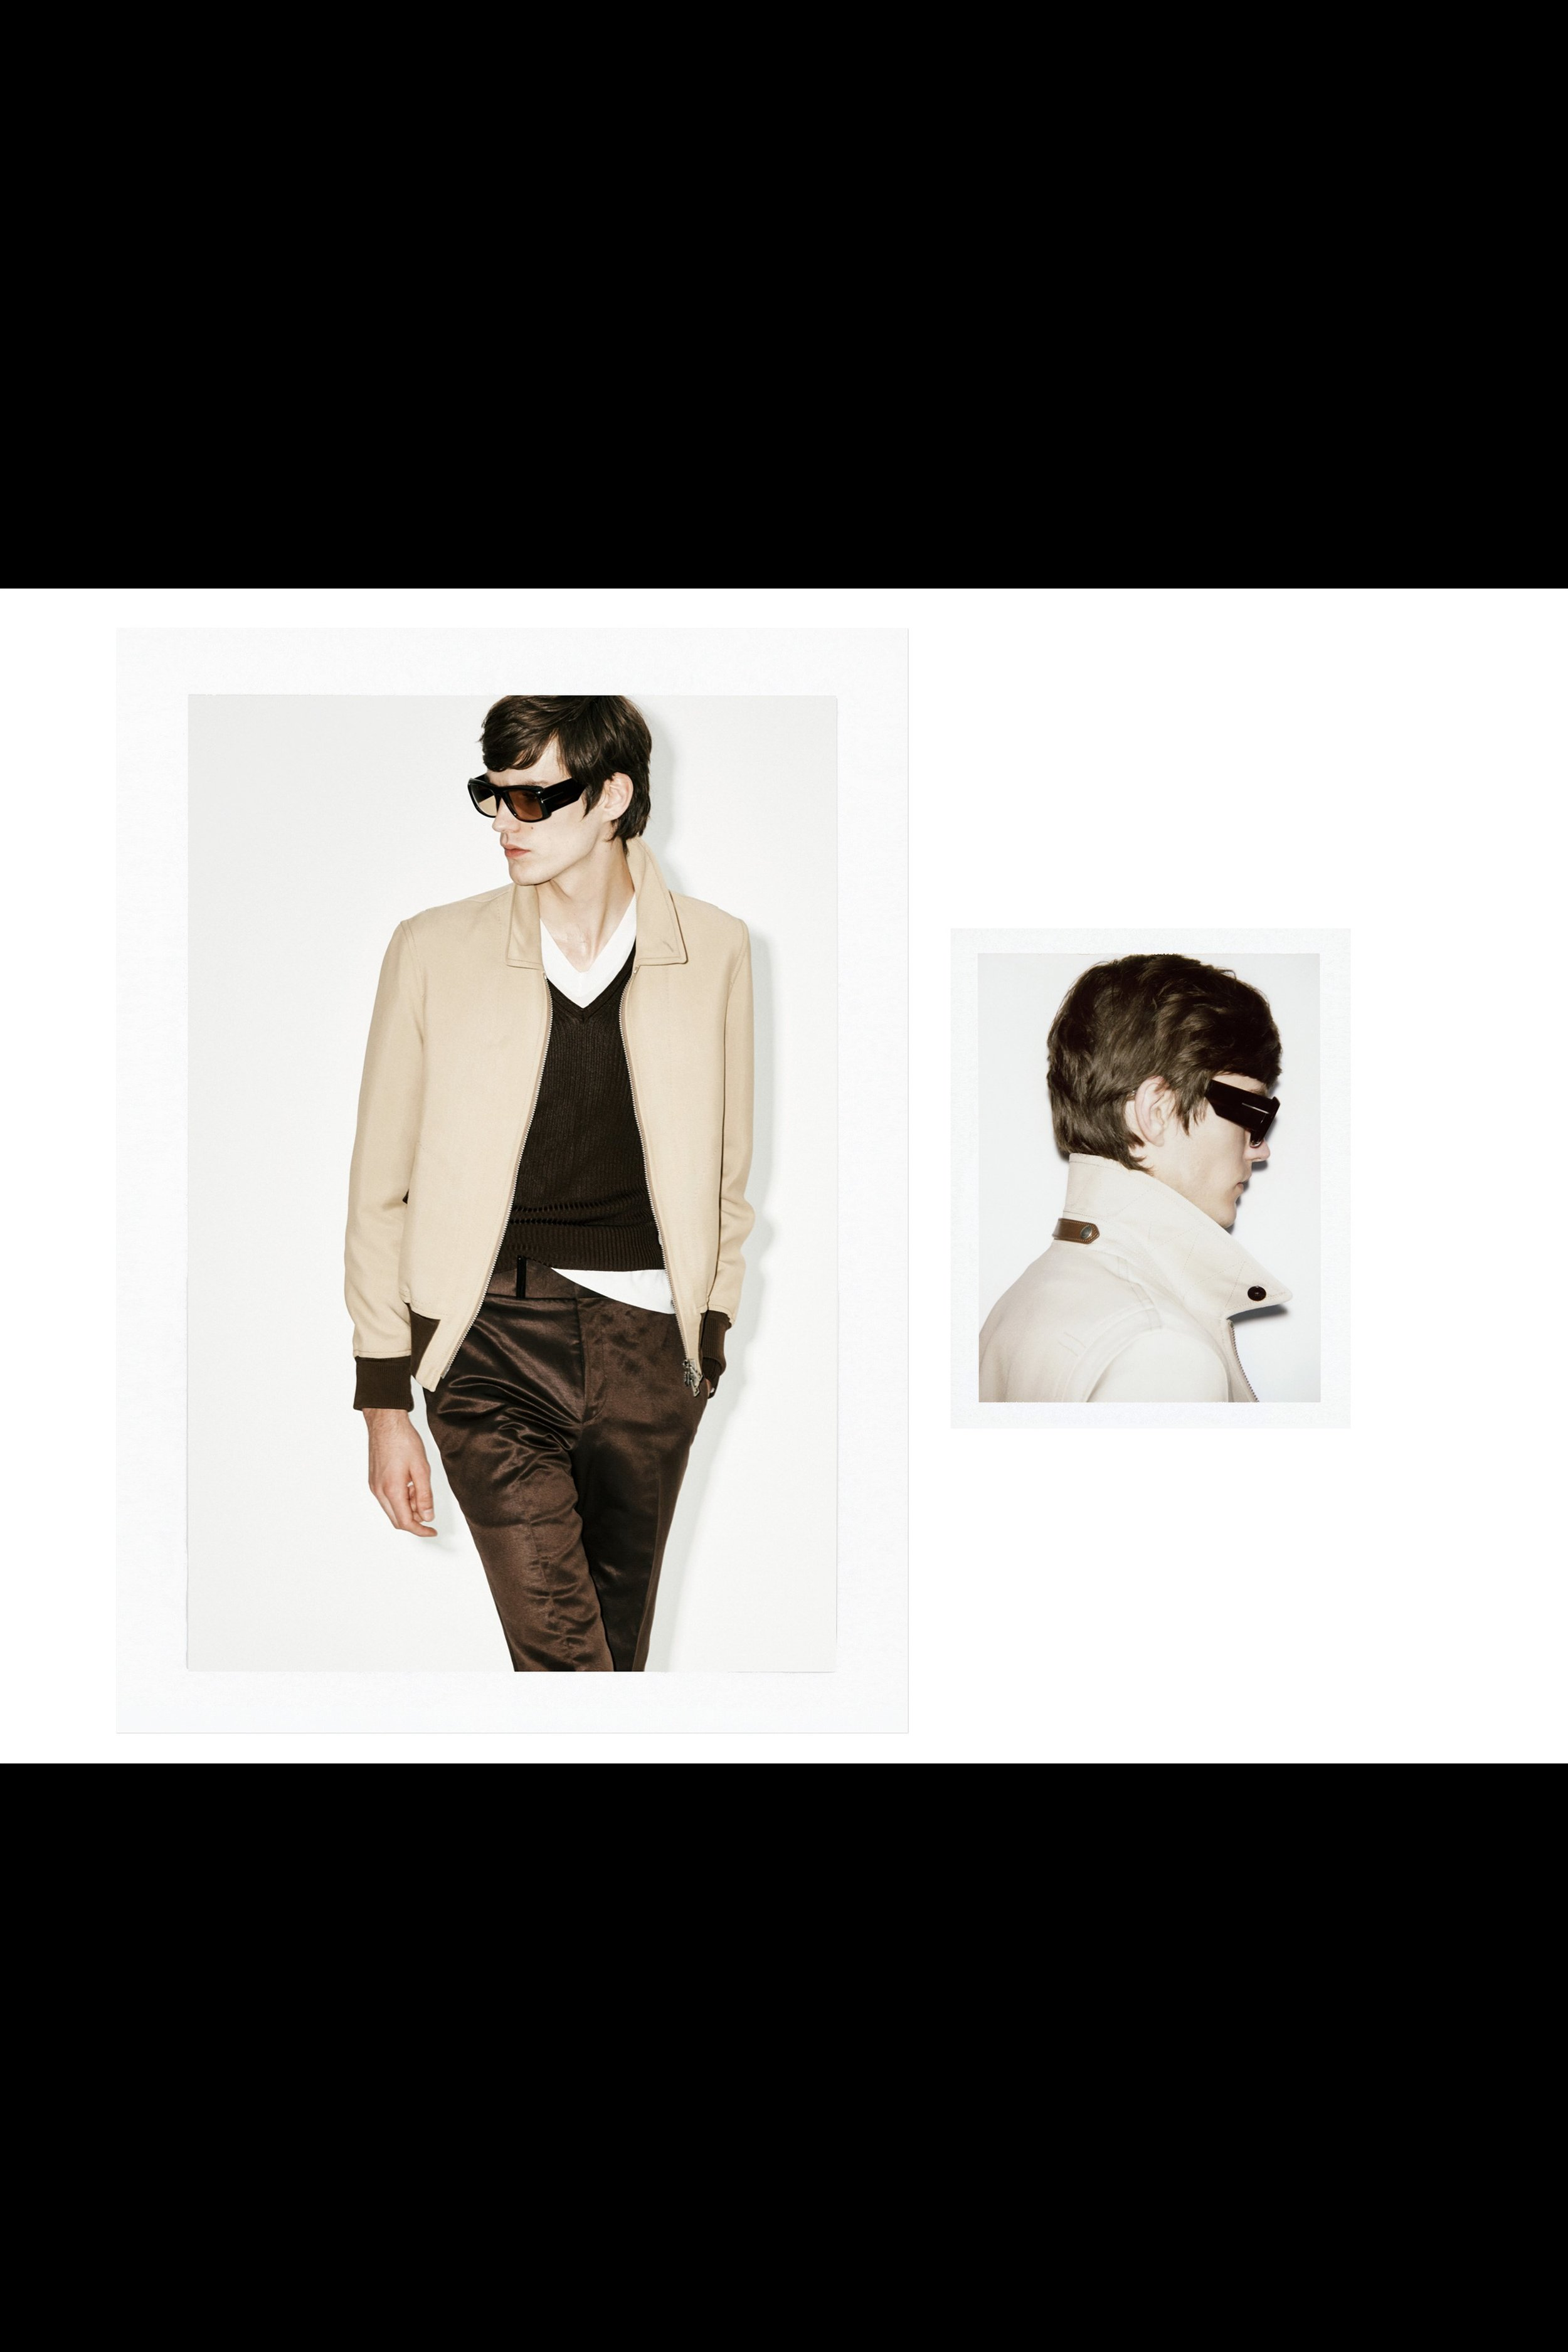 00017-Tom-Ford-vogue-menswear-spring-2019-pr.jpg